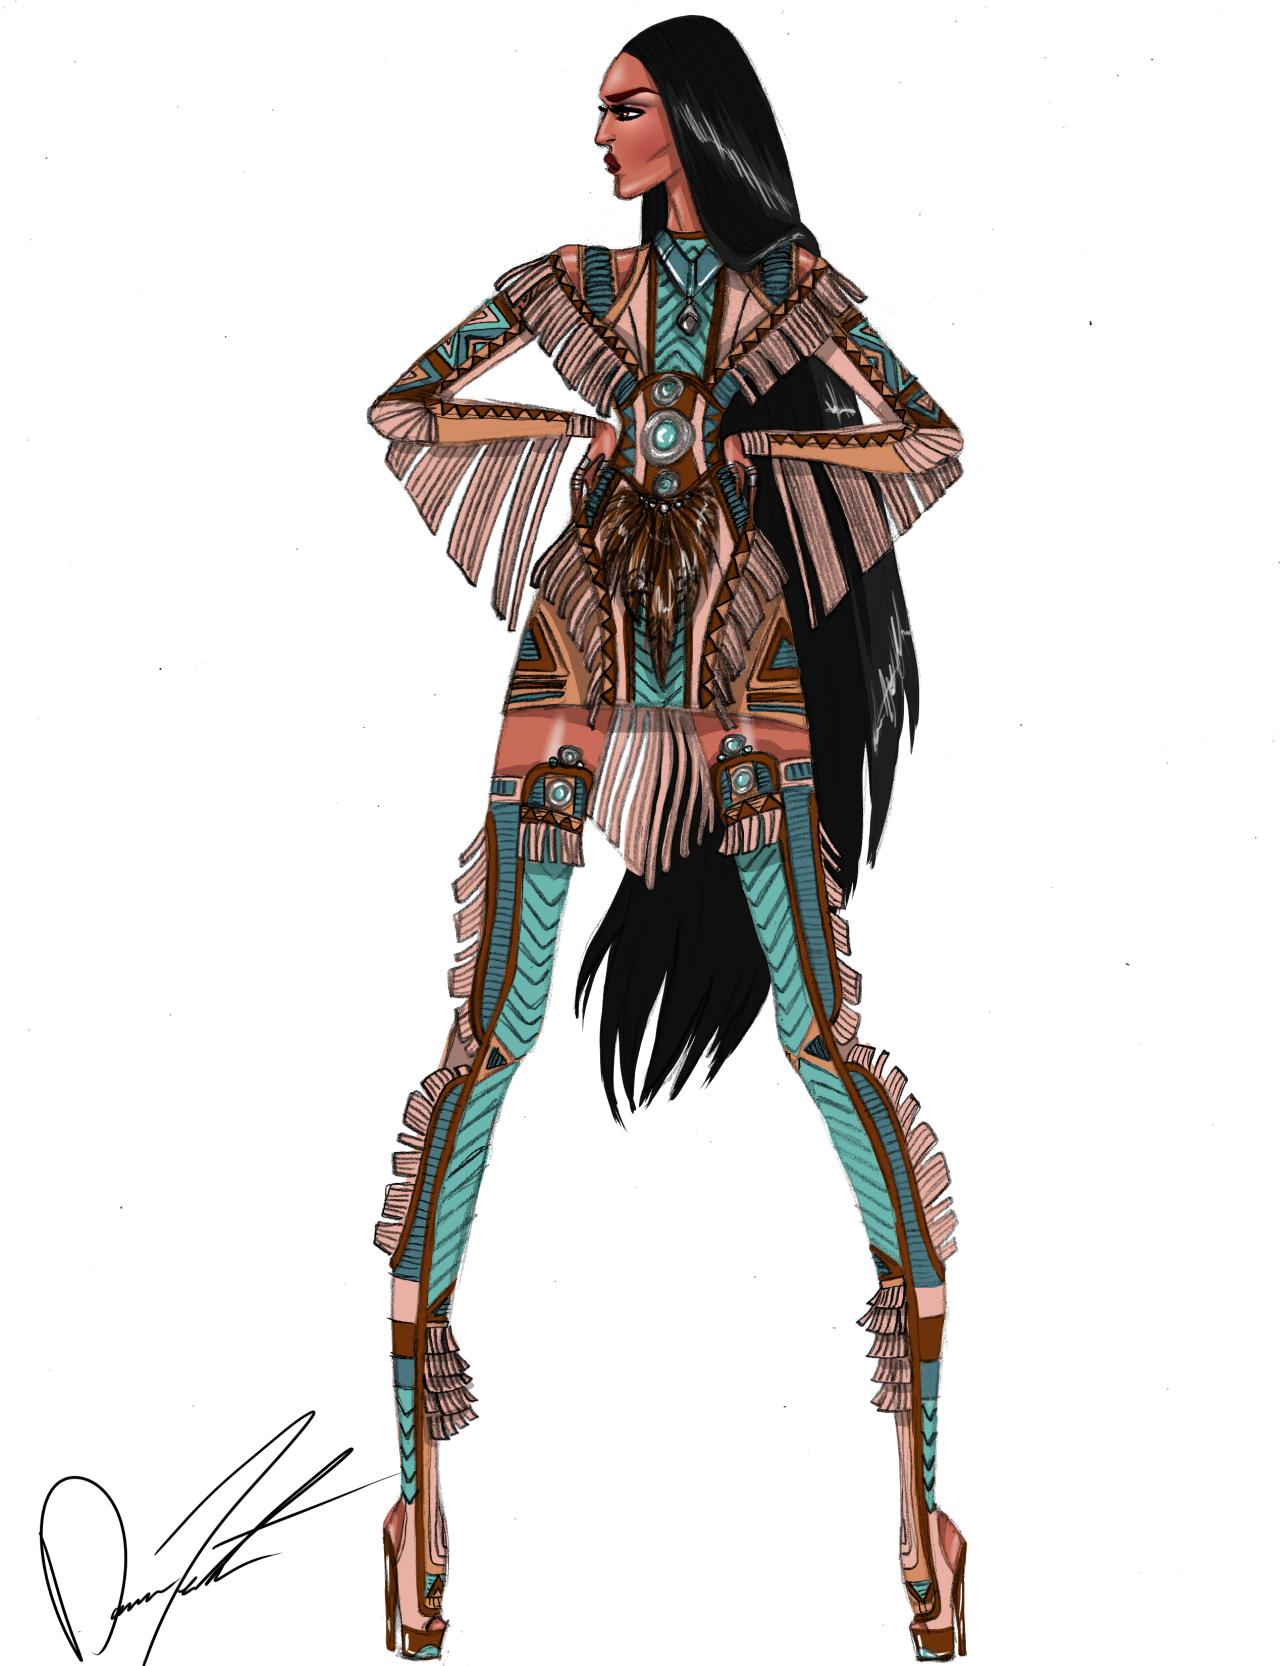 Disney Fashion For Everyone: Disney Fashion Frenzy, Pocahontas, The Drums Of